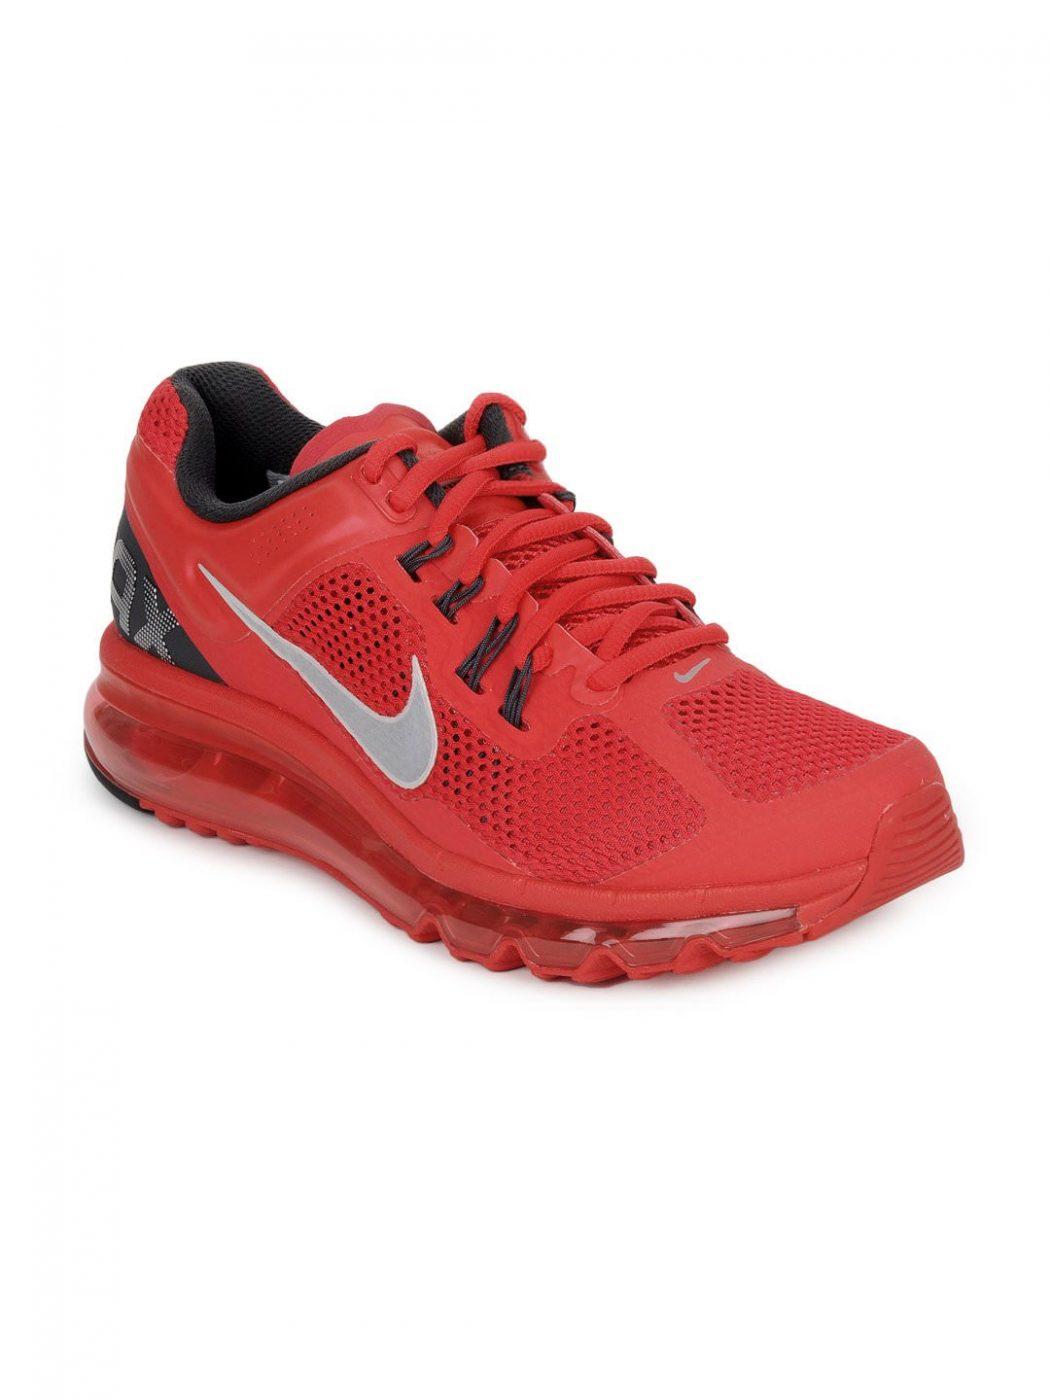 Nike-Men-Red-AIR-MAX-2013-Sports-Shoes_25b08f8e56d422edd4712953658578c0_images_1080_1440_mini The Most Stylish Nike Shoes For Men